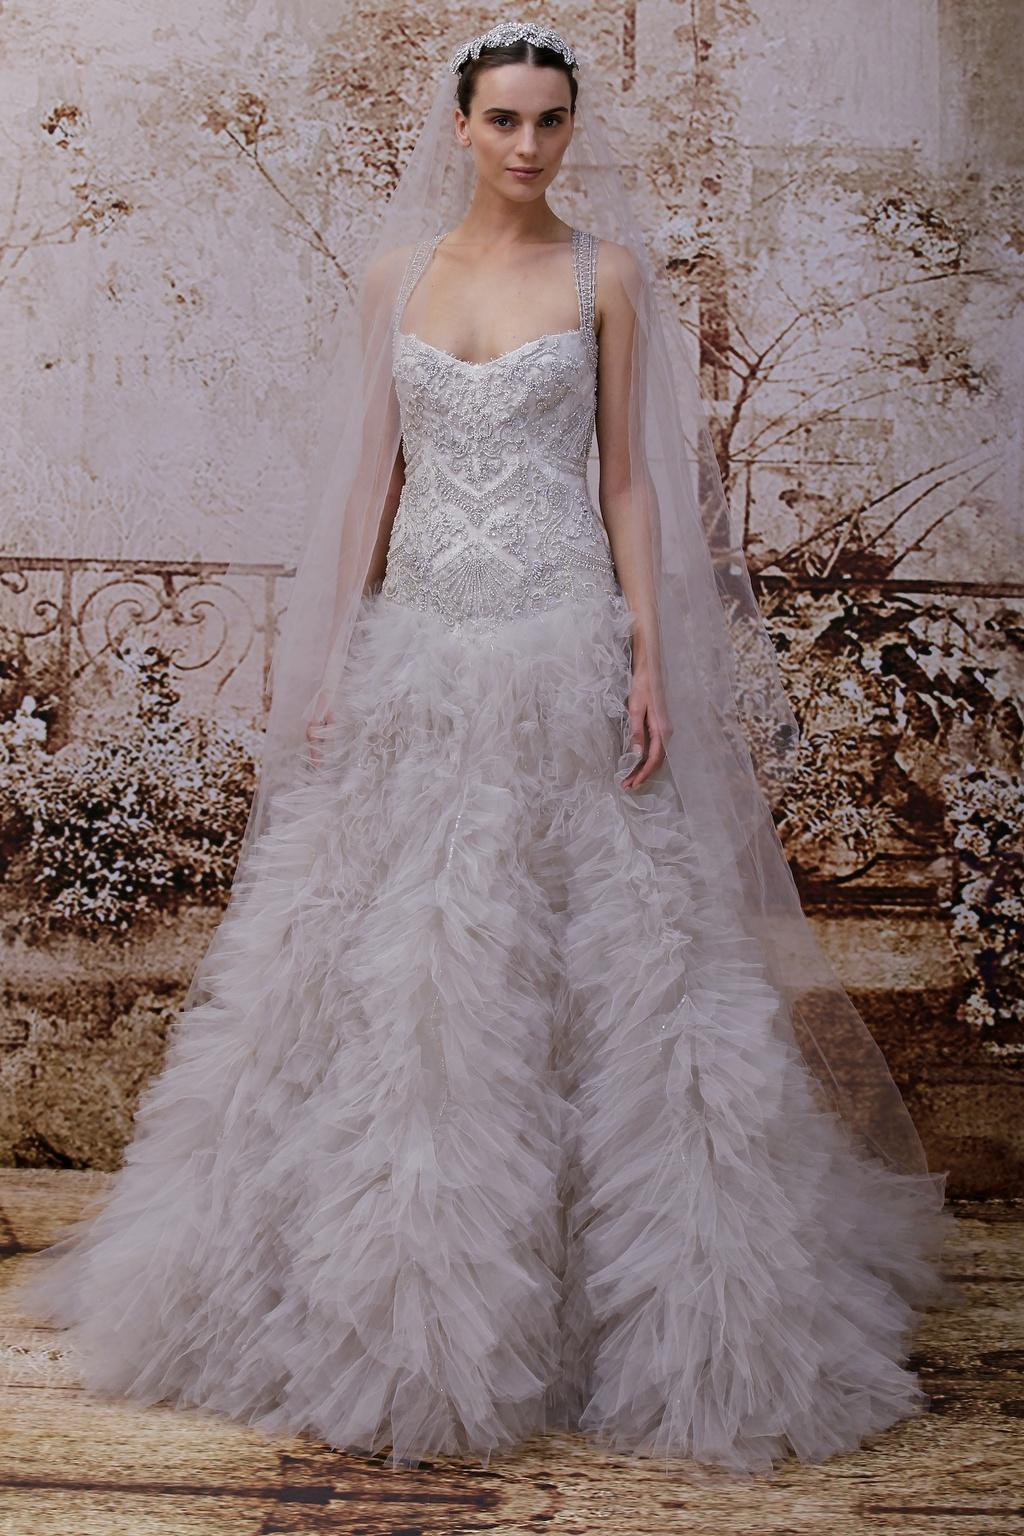 Wedding-dress-by-monique-lhuillier-fall-2014-bridal-look-34.full